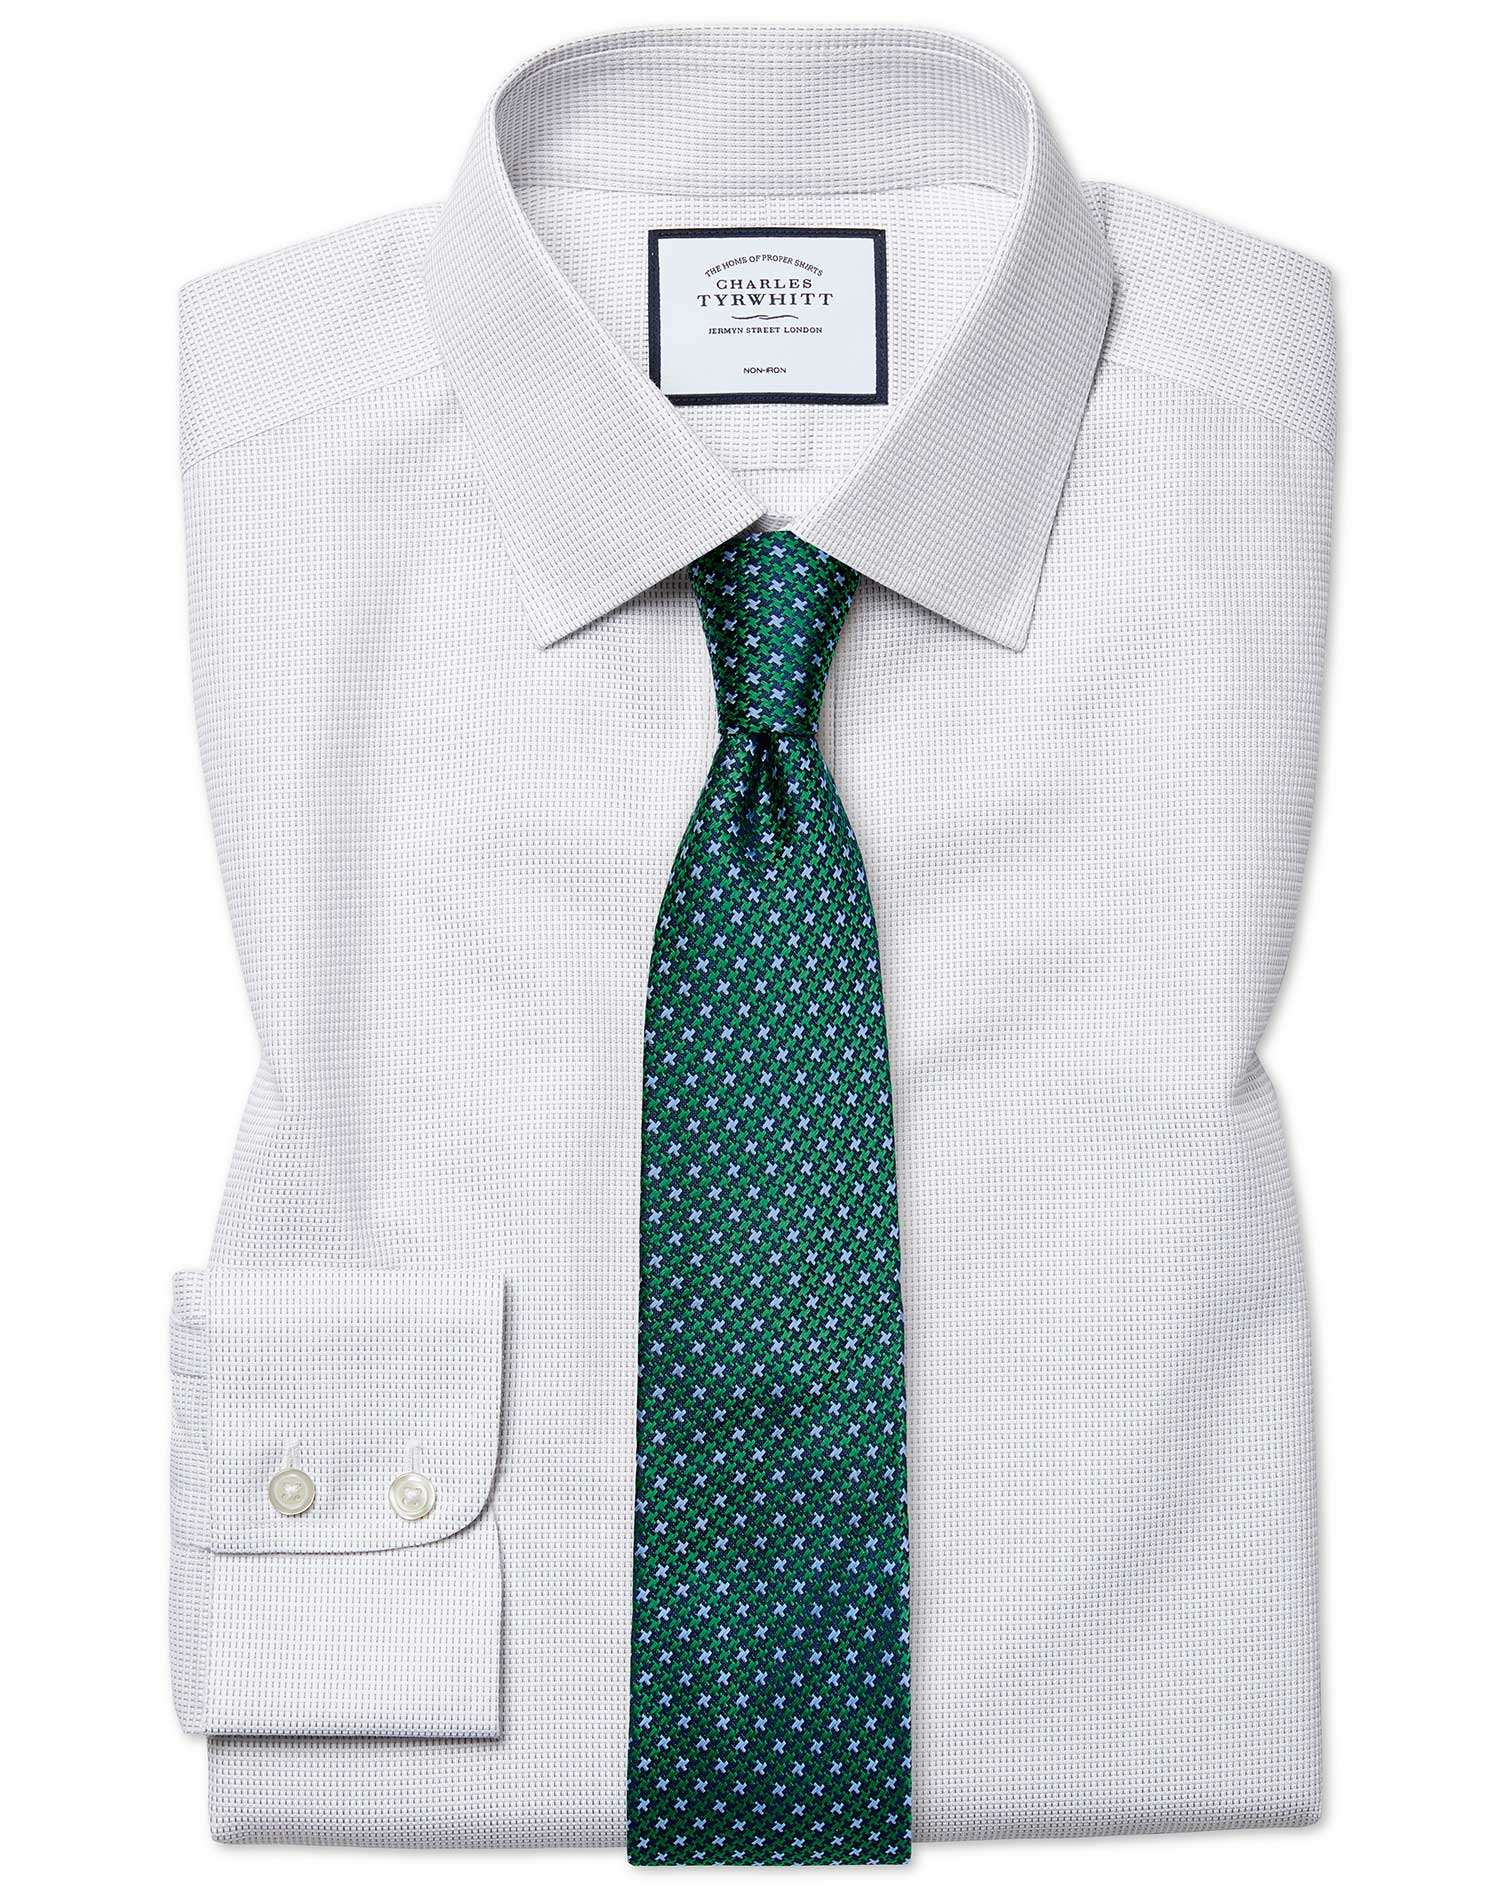 Cotton Slim Fit Non-Iron Dash Weave Grey Shirt